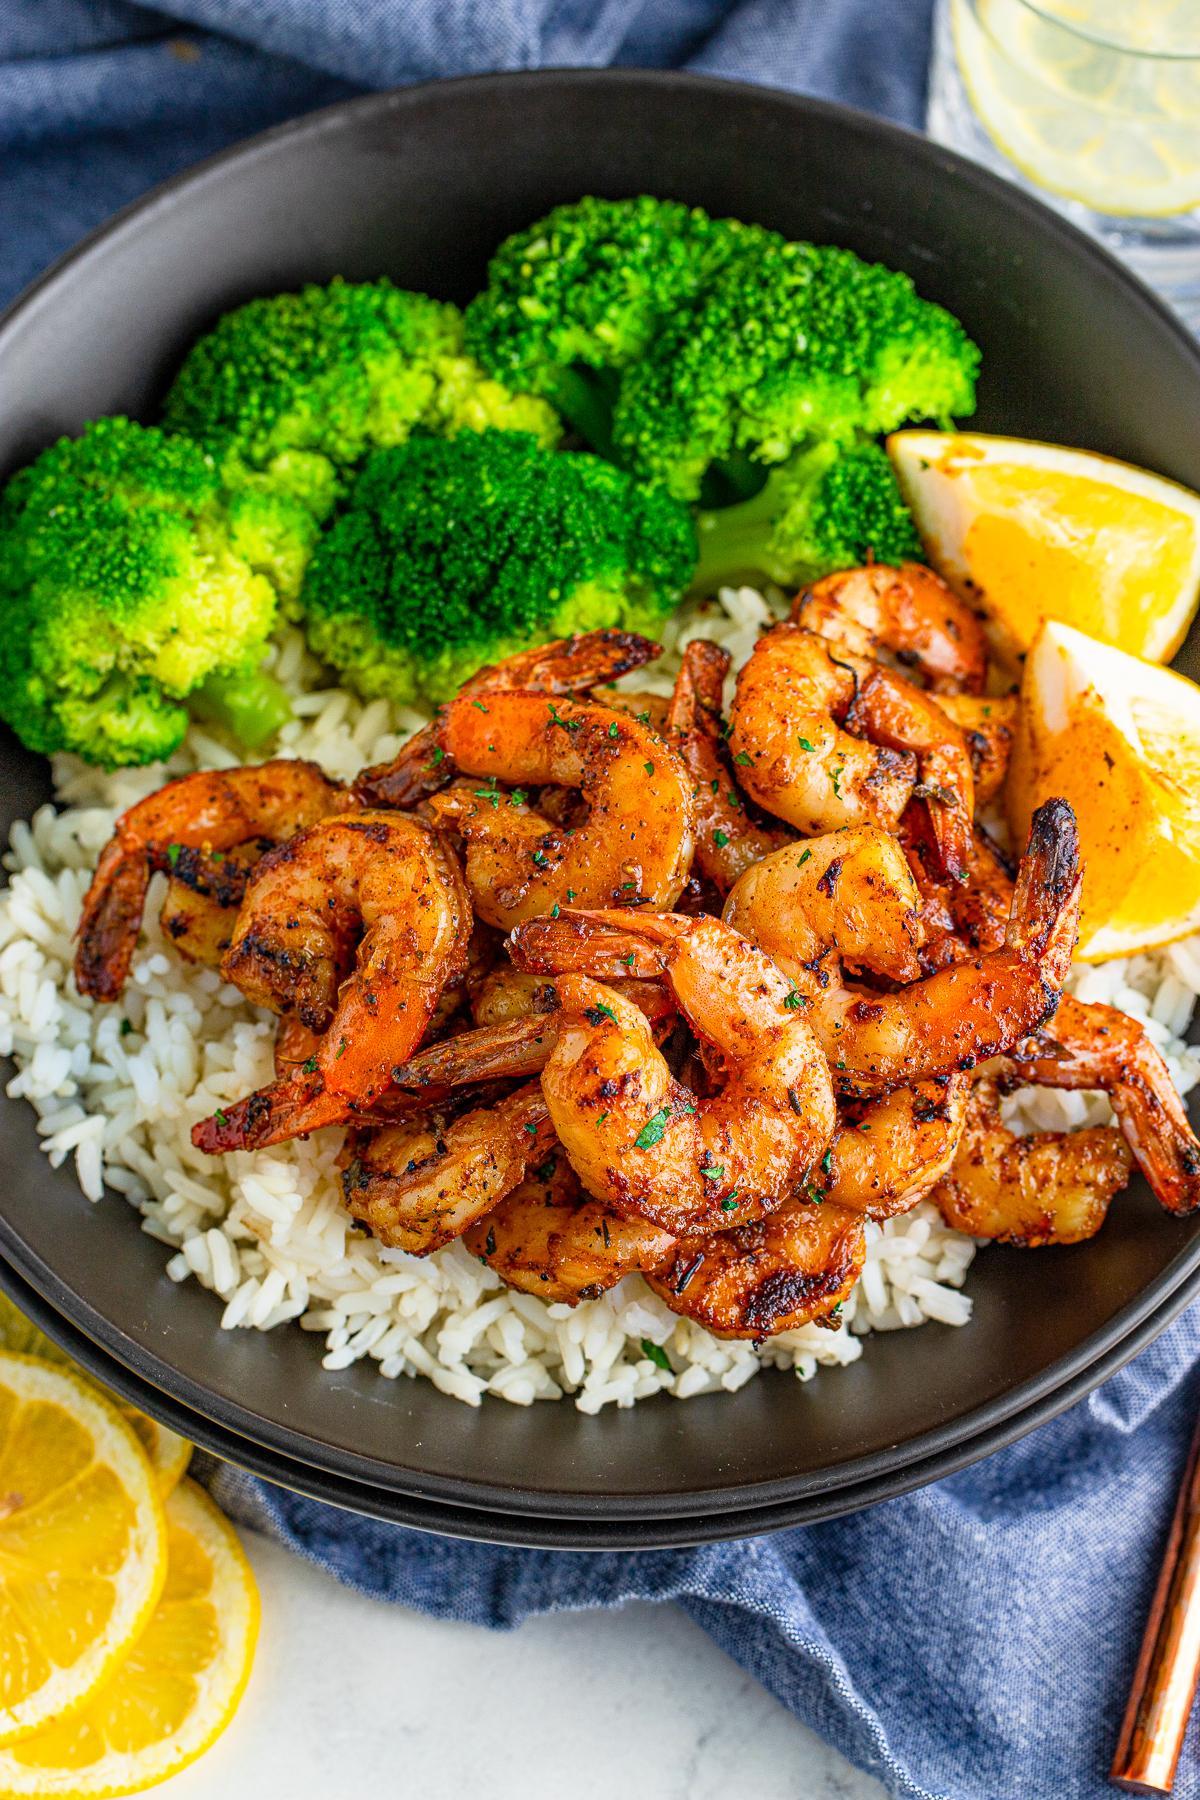 Shrimp overhead photo on black plate with rice and broccoili